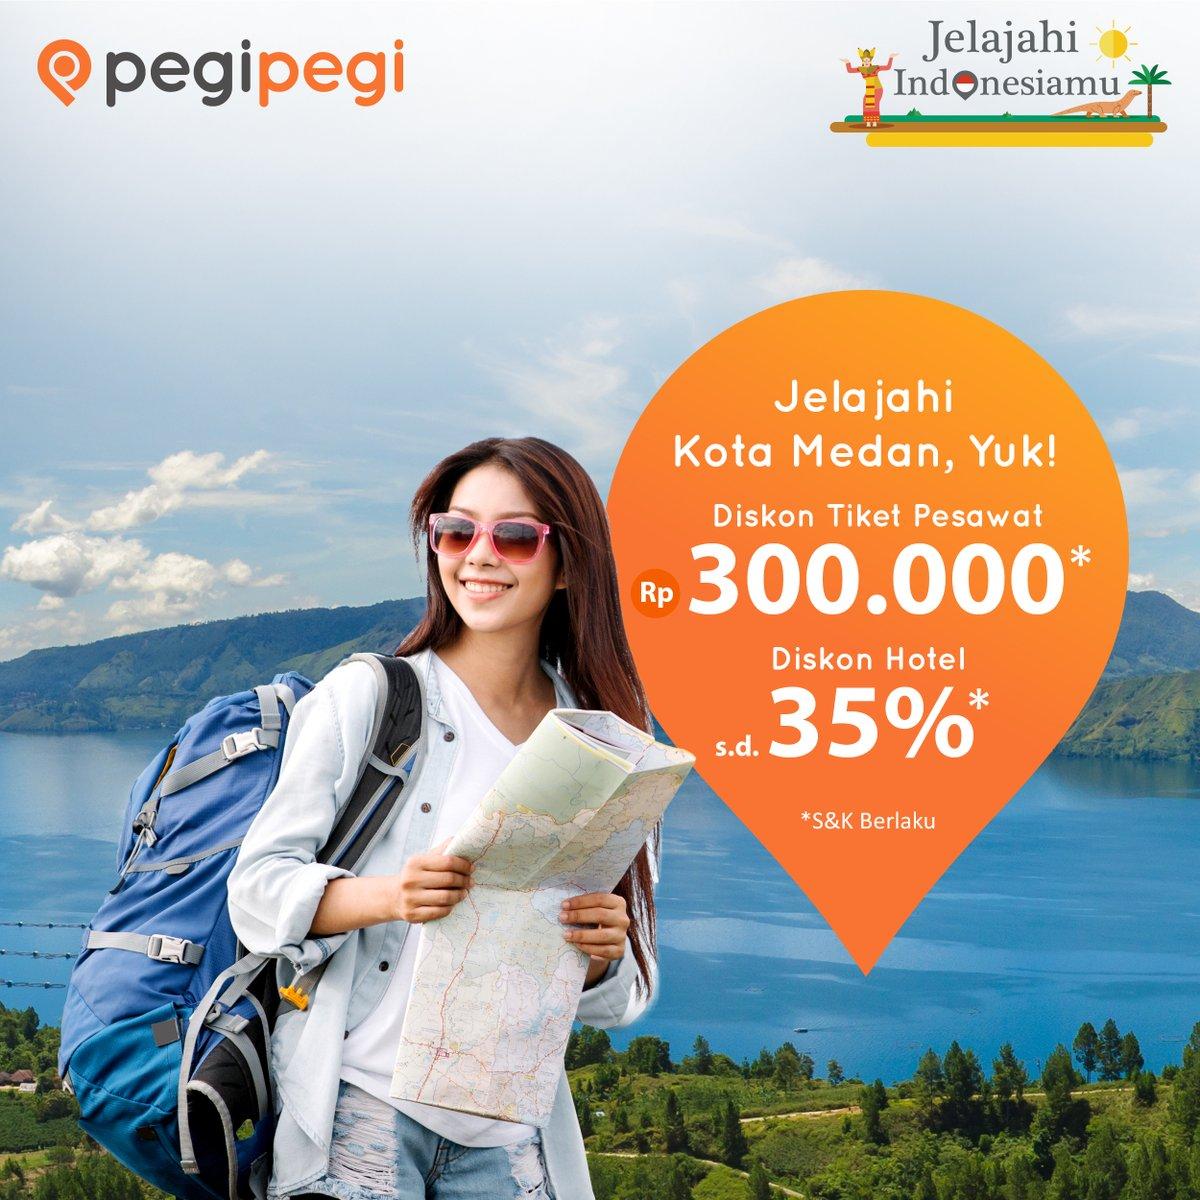 PegiPegi - Promo Tiket Ke Medan Diskon s.d 300 Ribu & Diskon Hotel s.d 35%